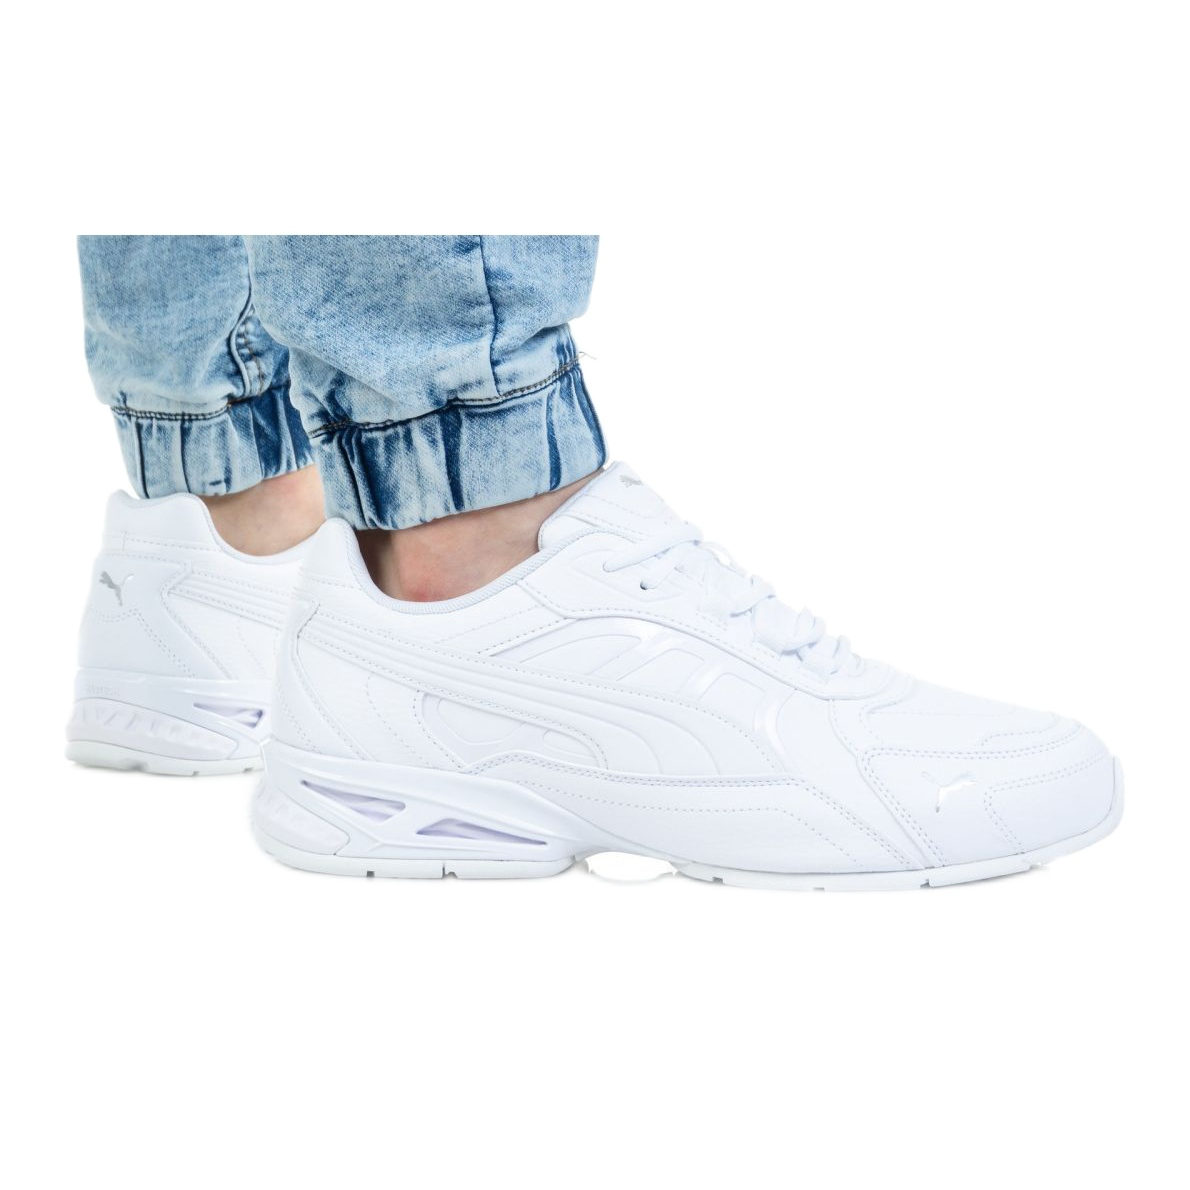 Shoes Puma Respin Sl M 368846 02 white